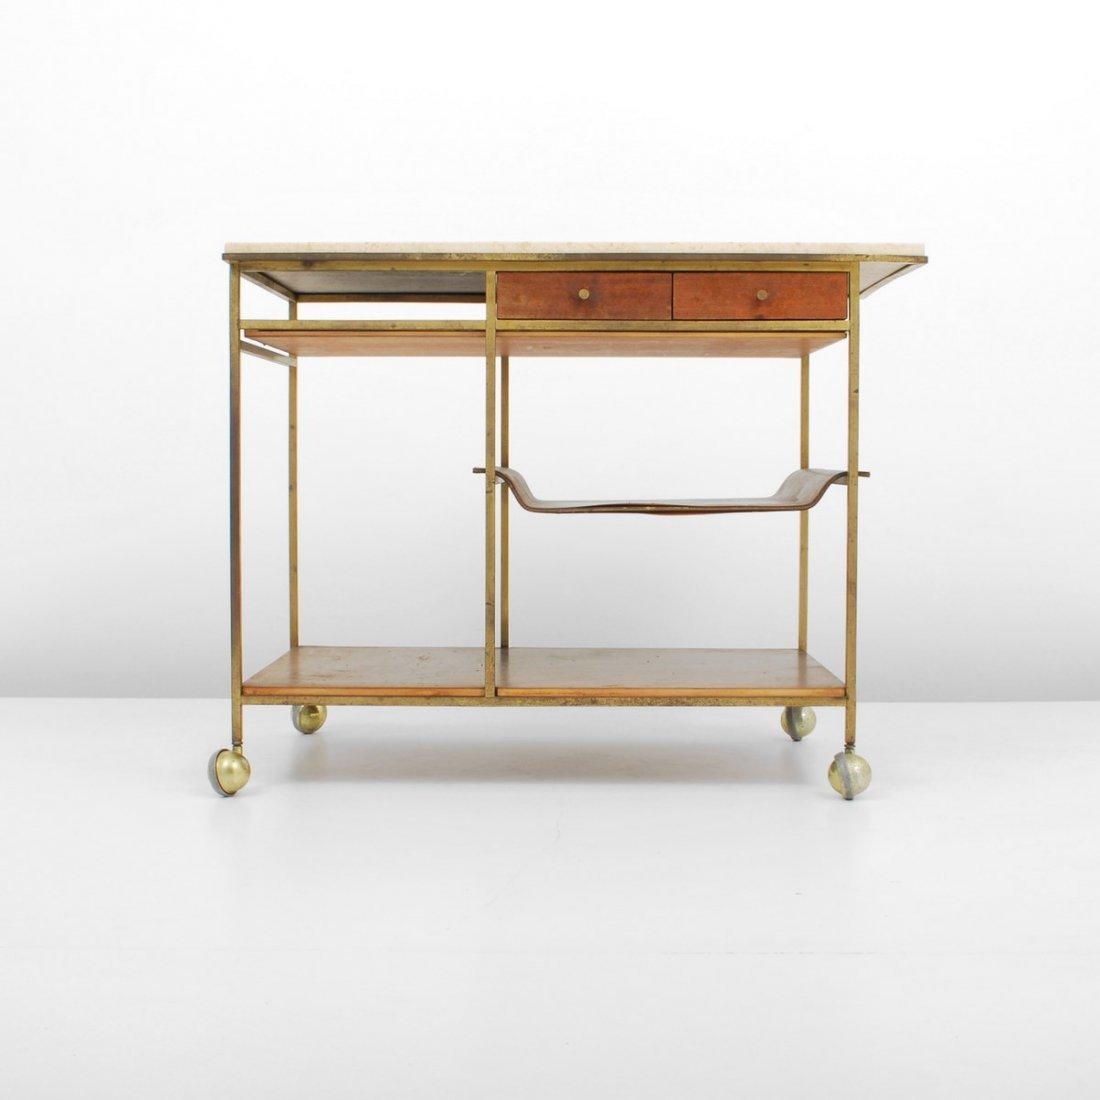 Paul McCobb Tea Cart, Irwin Collection